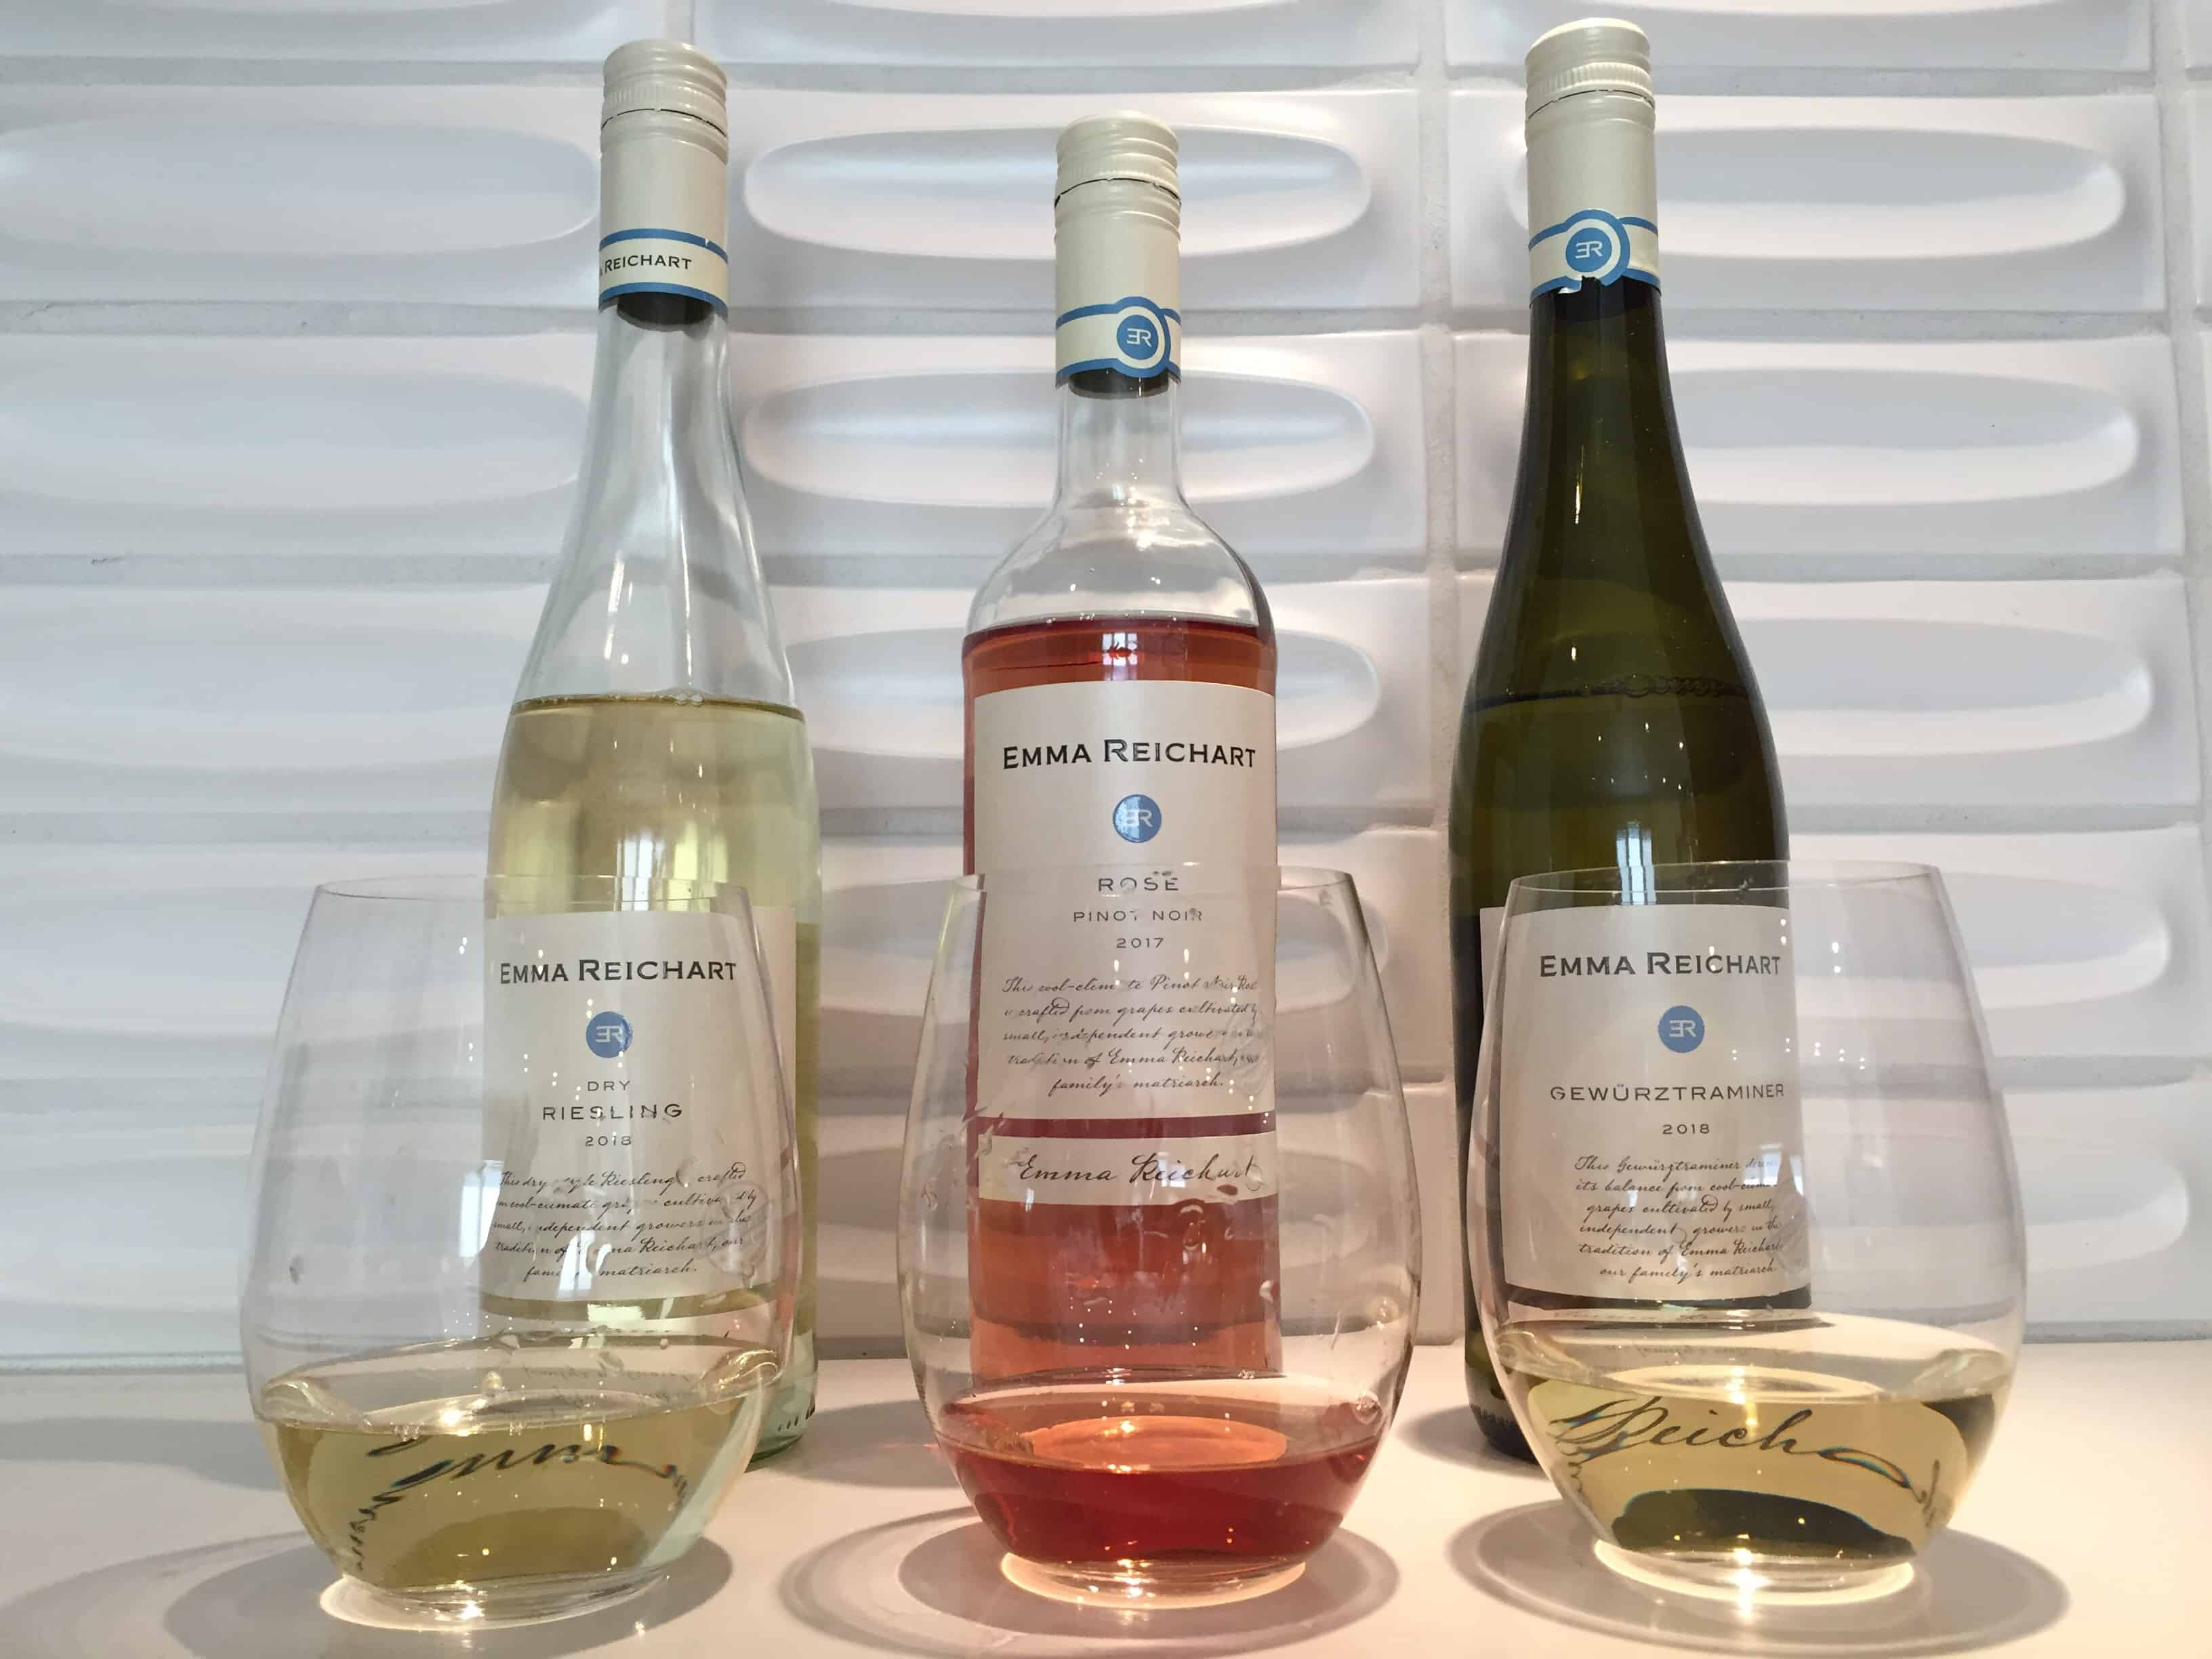 Three glasses and three bottles of wine